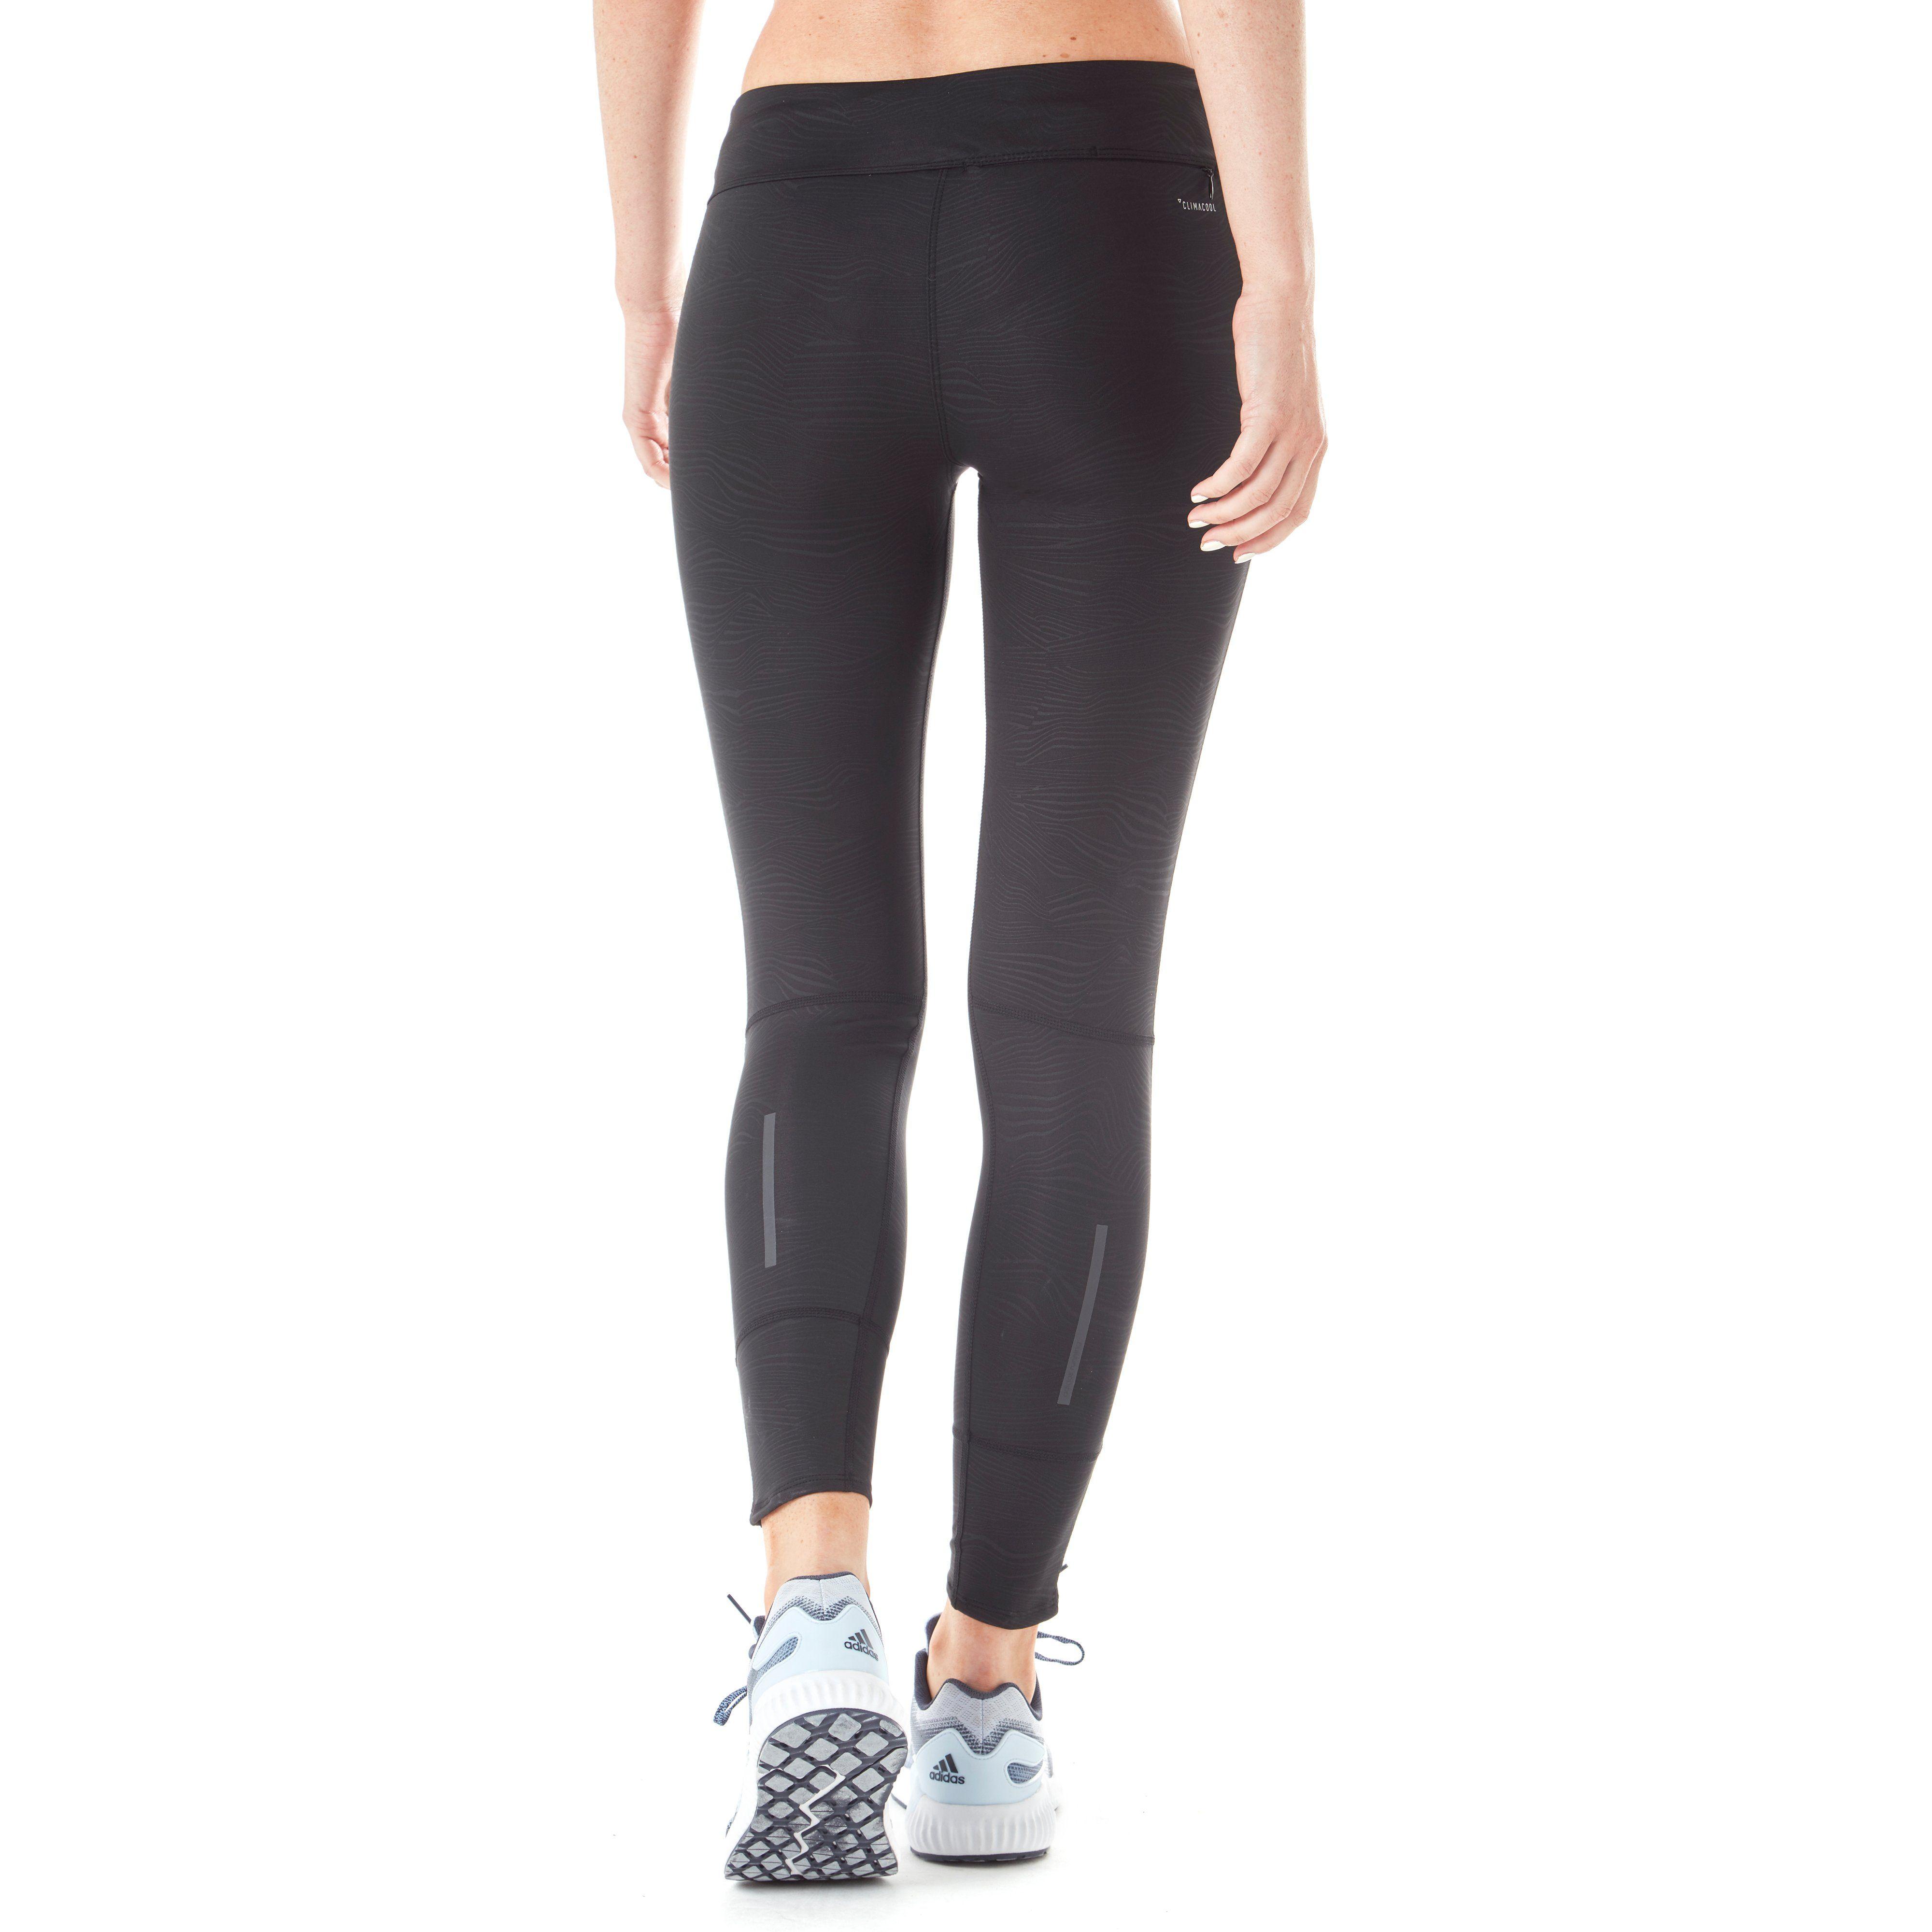 adidas Response Long Women's Running Tights